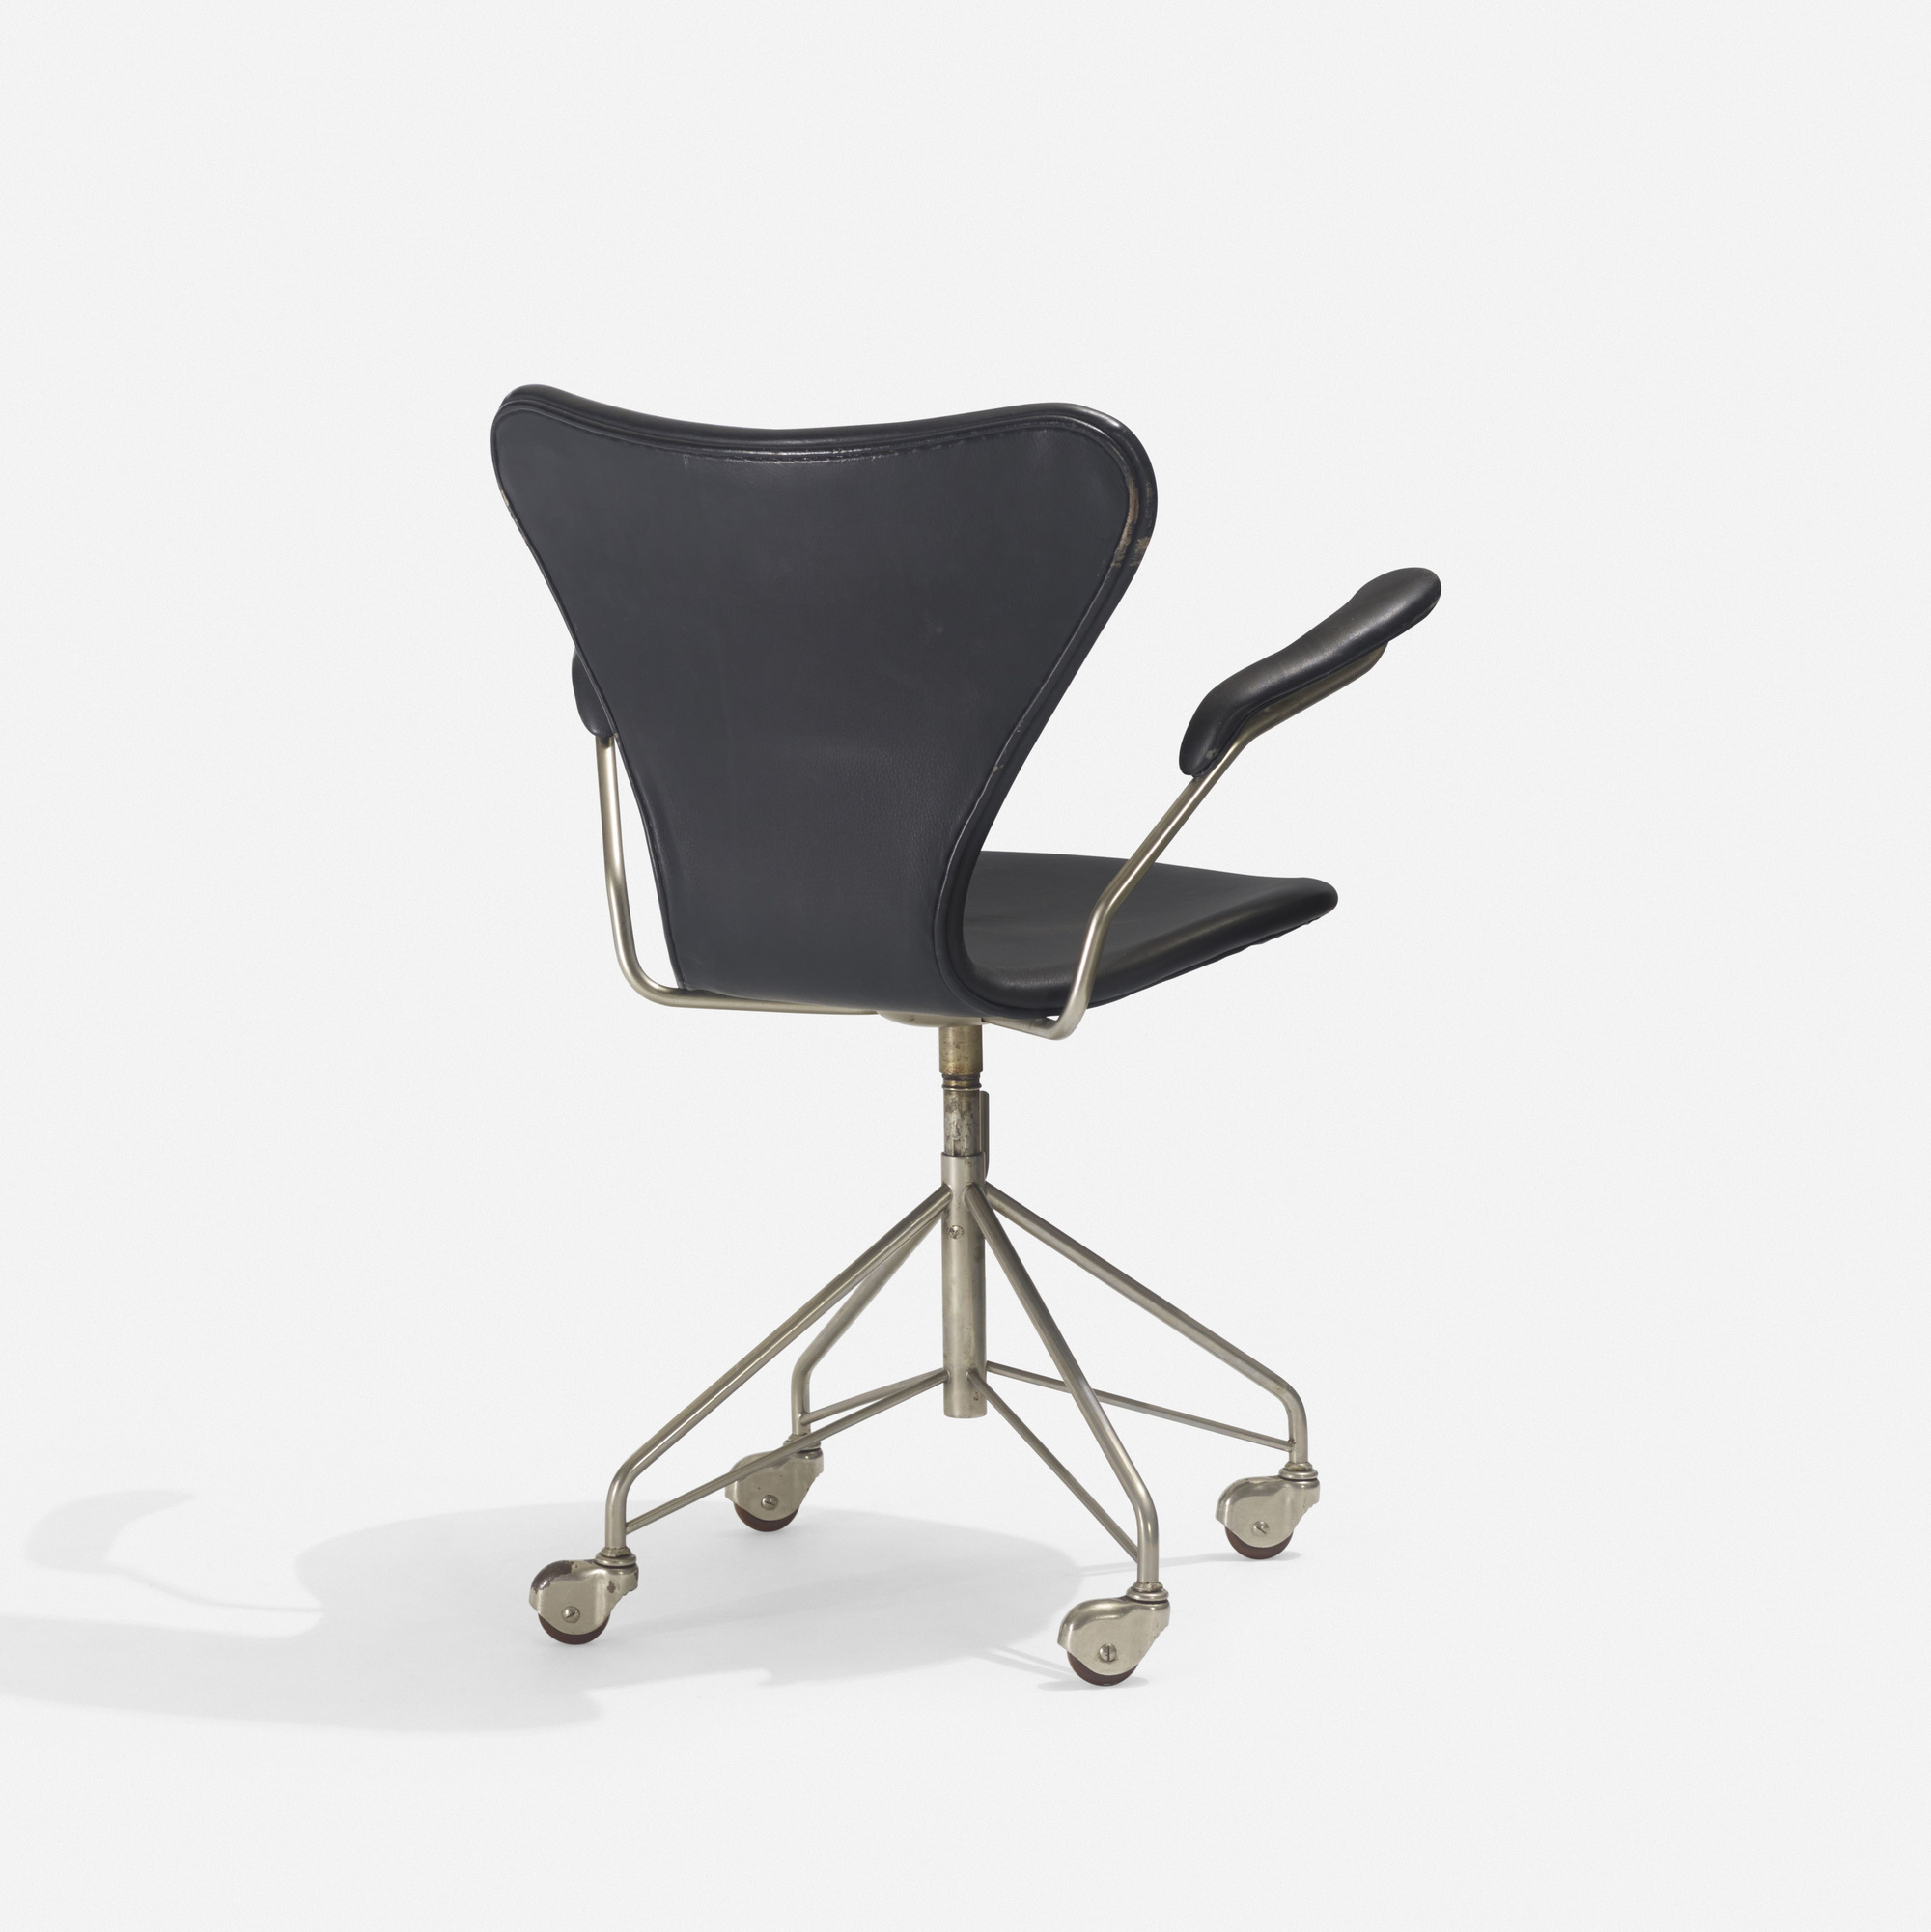 221 arne jacobsen office chair